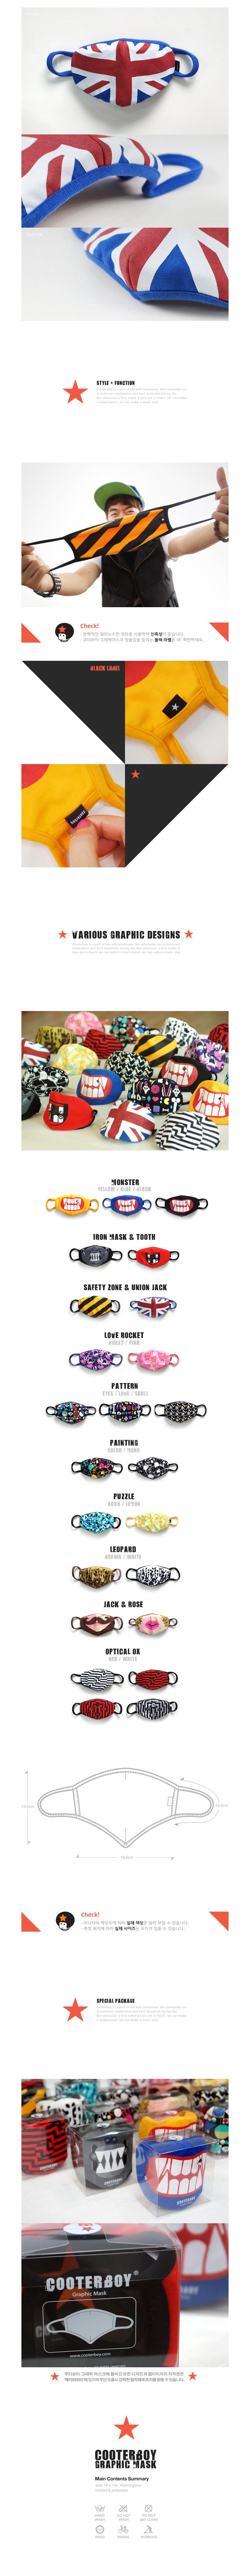 CooterBoy Design Black 100/% Cotton Face Mask Unisex Adult Anti-dust  K-pop Mask